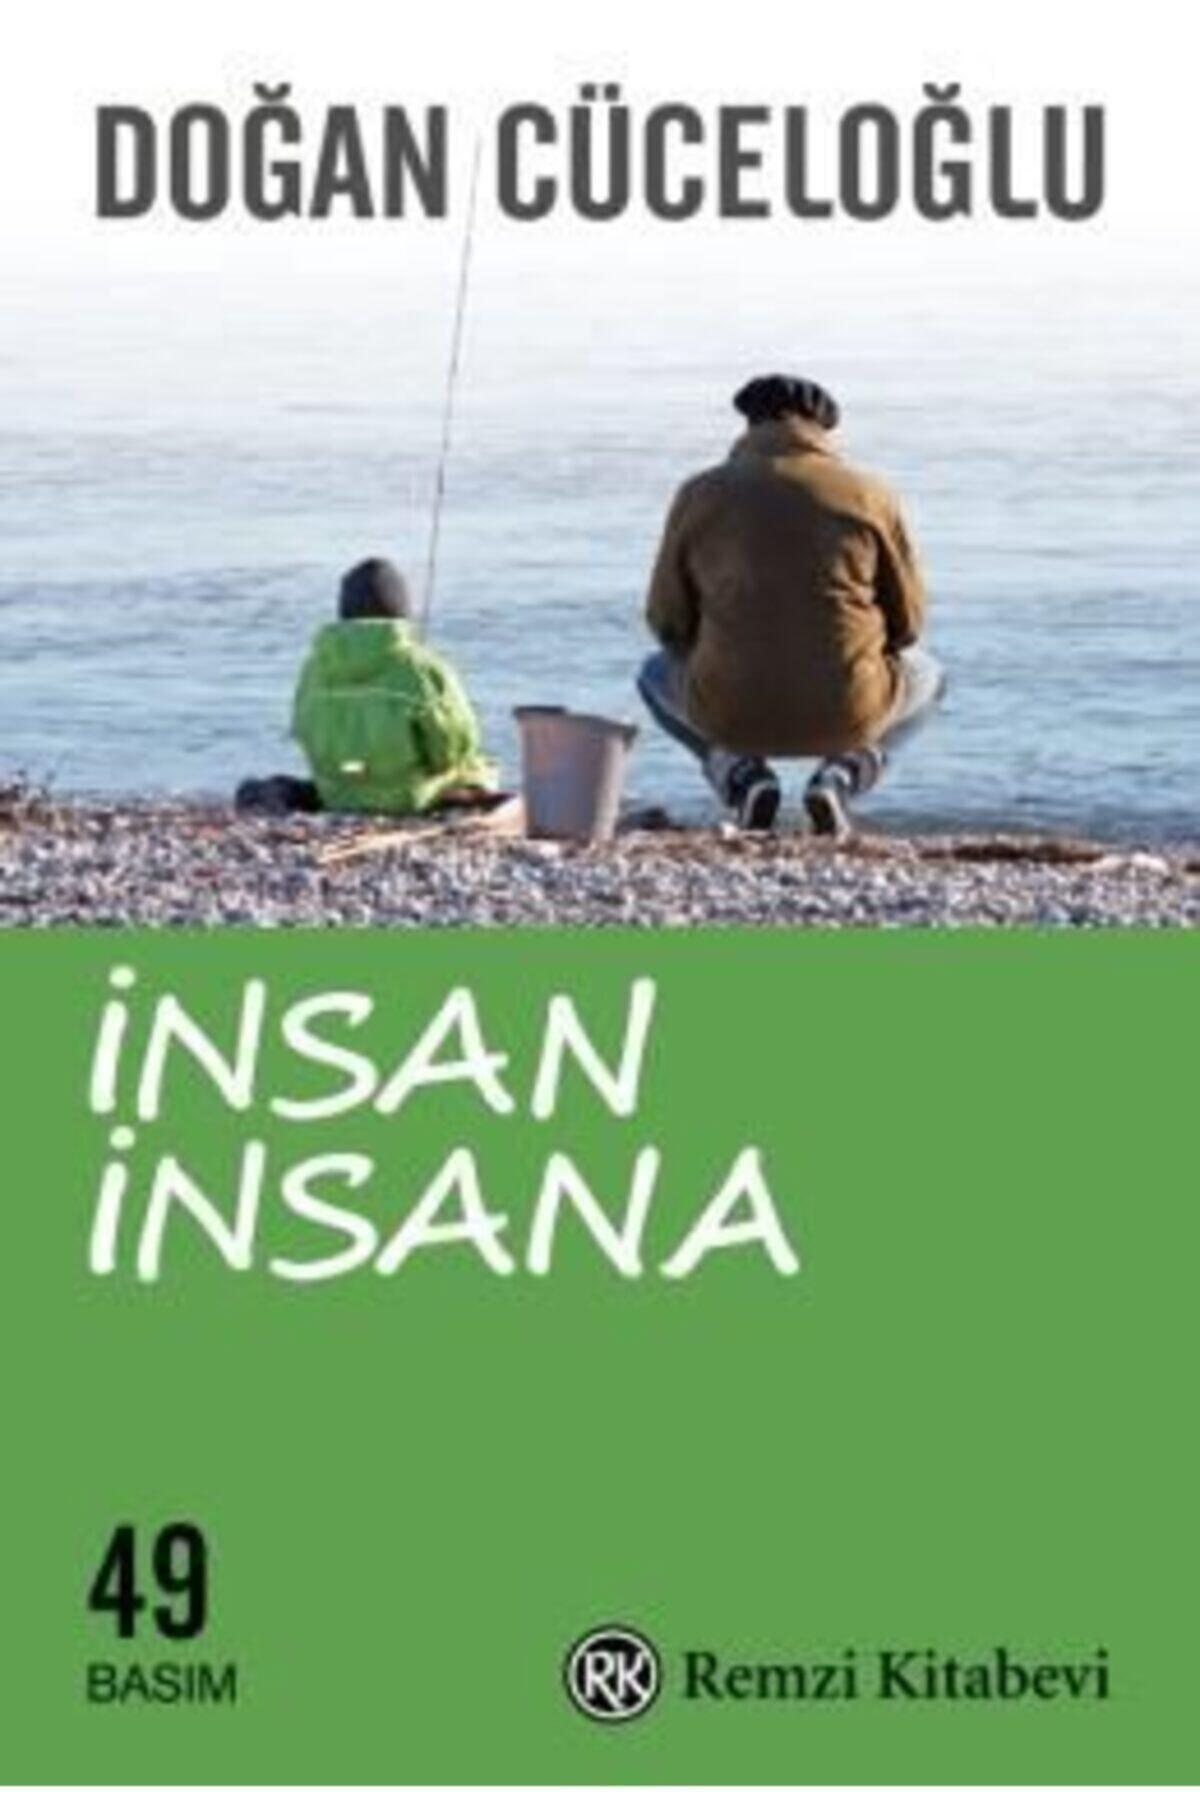 Remzi Kitabevi Insan Insana | Doğan Cüceloğlu | 1